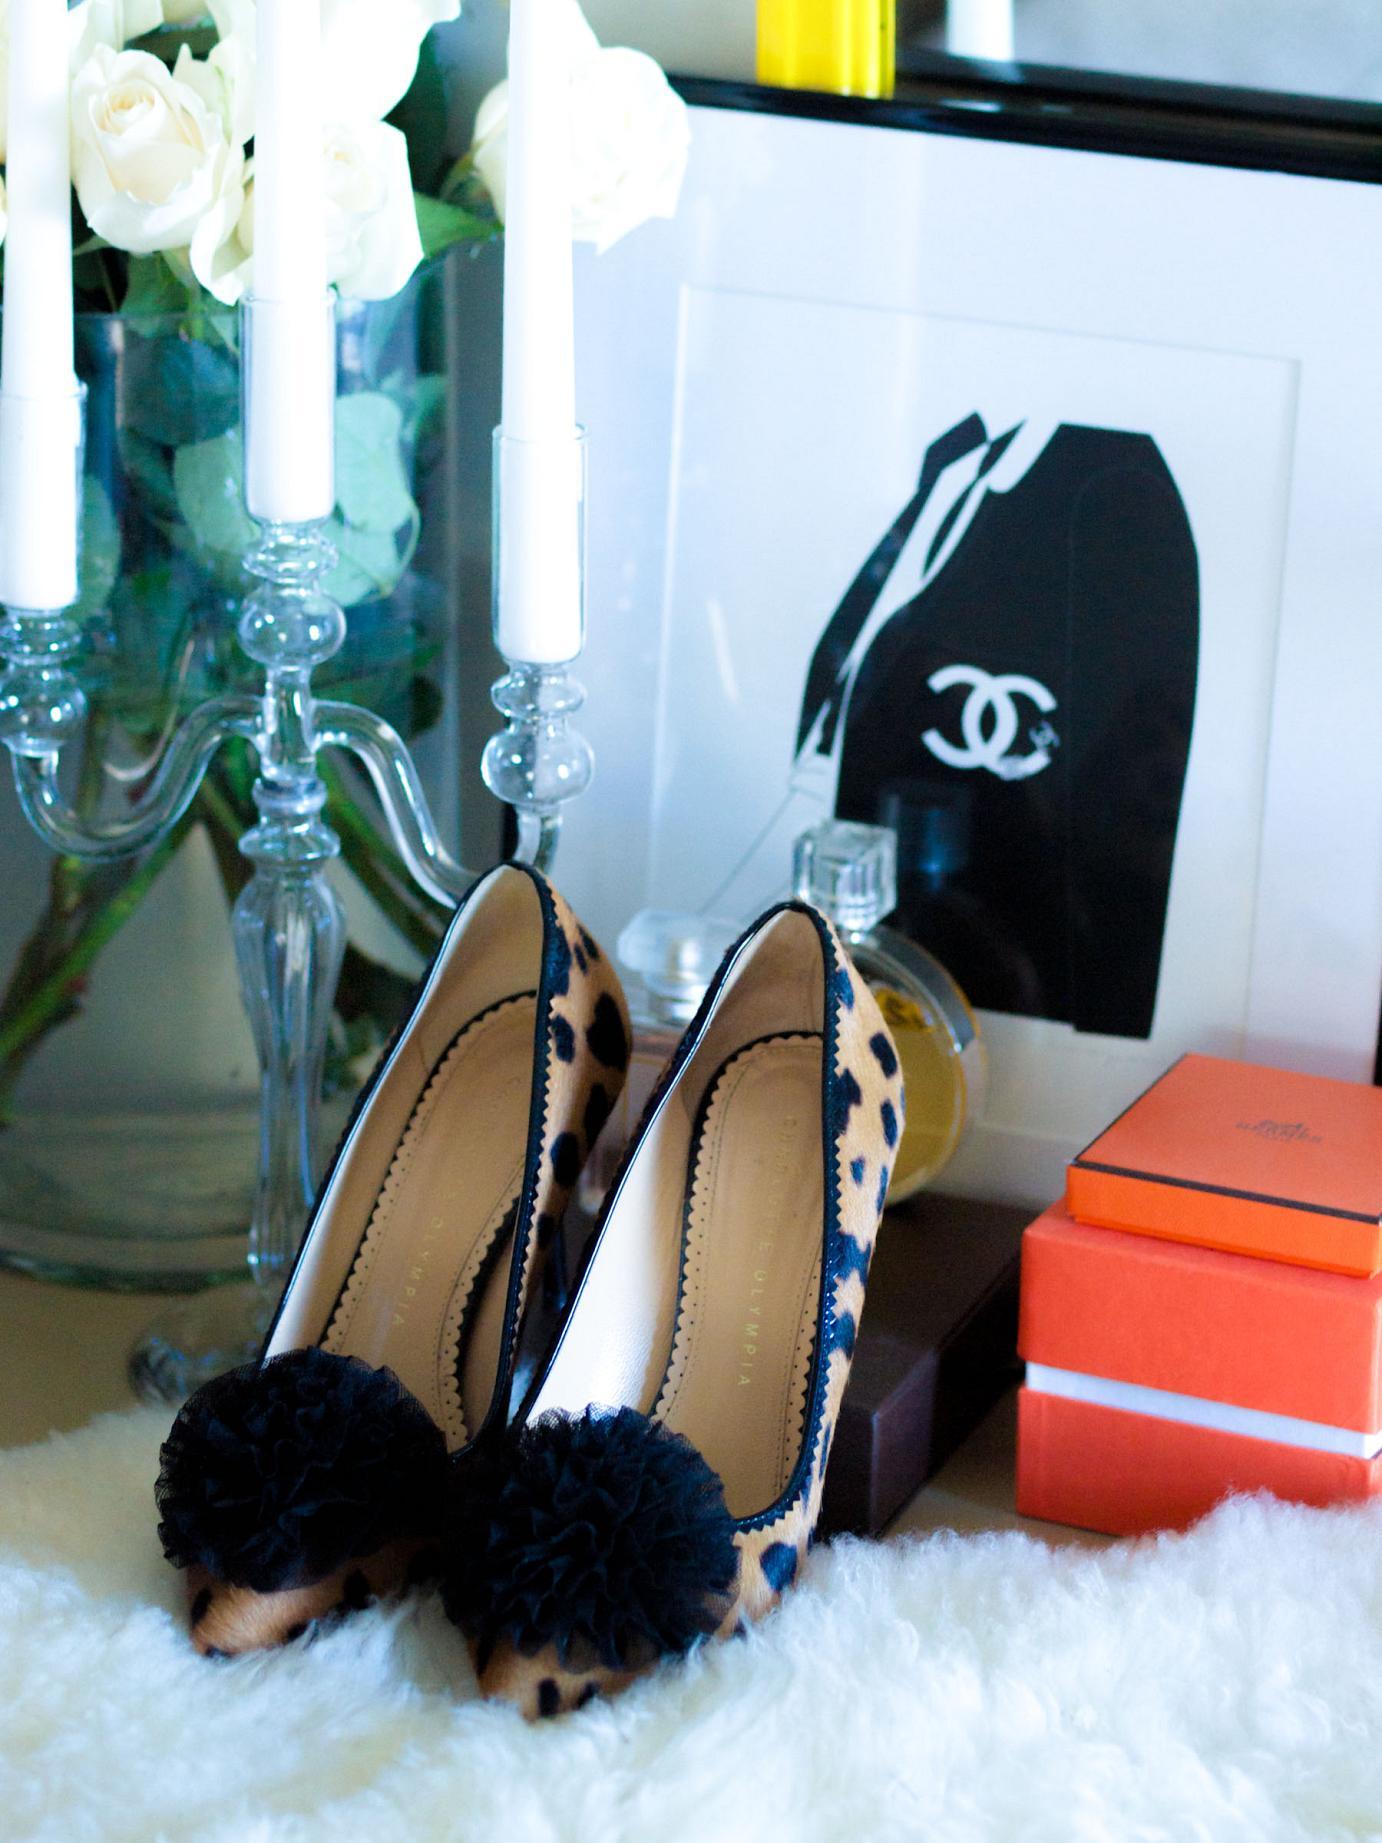 bittersweet colours, details, details from my closet, chanel bracelet, chanel eau the parfum, colorful shoes, closet organization ideas, colors, shoes, charlotte olympia shoes, christian louboutin shoes, j.crew shoes, miu miu shoes,